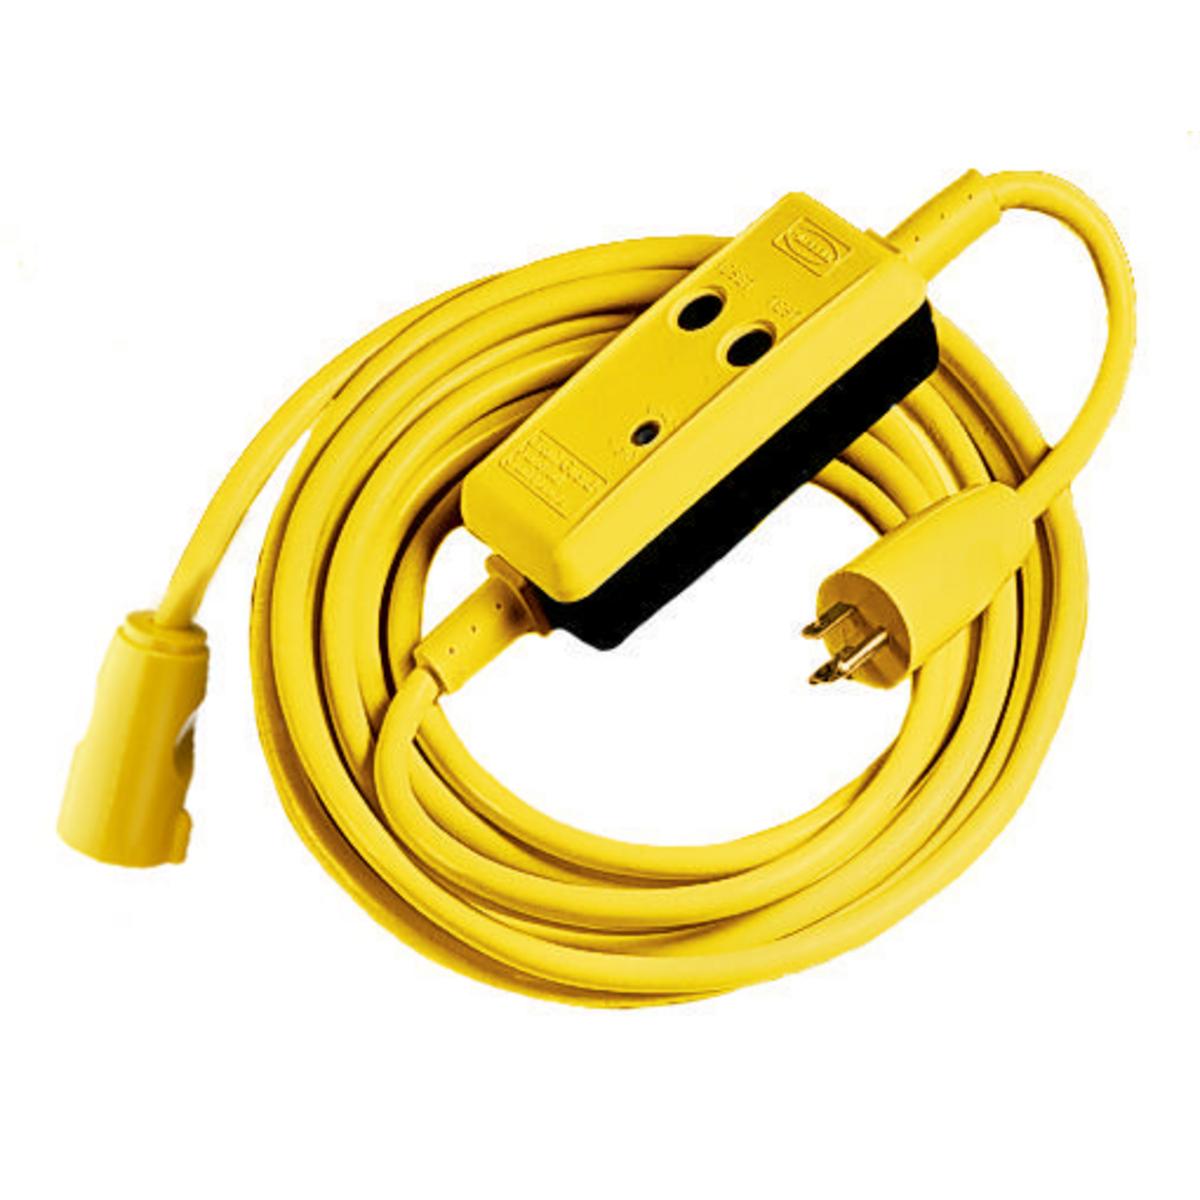 Hubbell GFP25C15M 120 Volt 15 Amp 25 Foot Industrial Manual Set GFCI Linecord